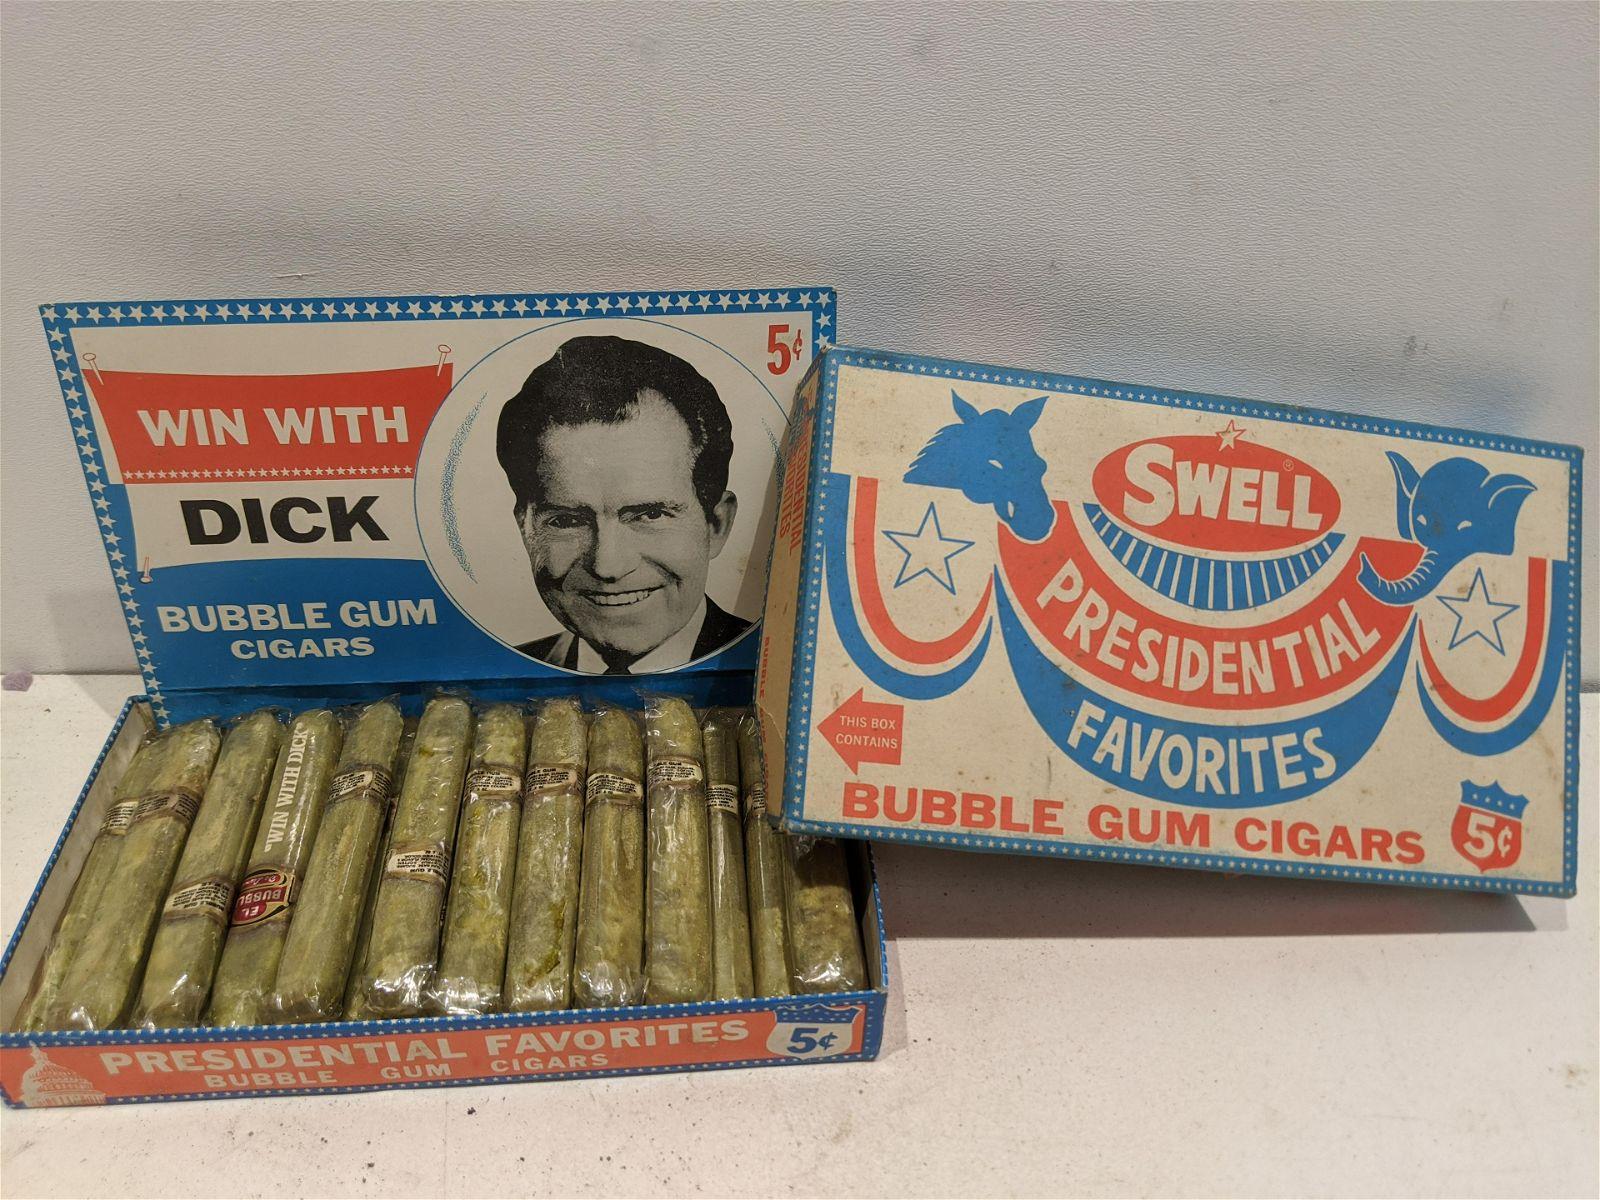 Swell Presidential Favorites Bubble Gum Nixon Cigars